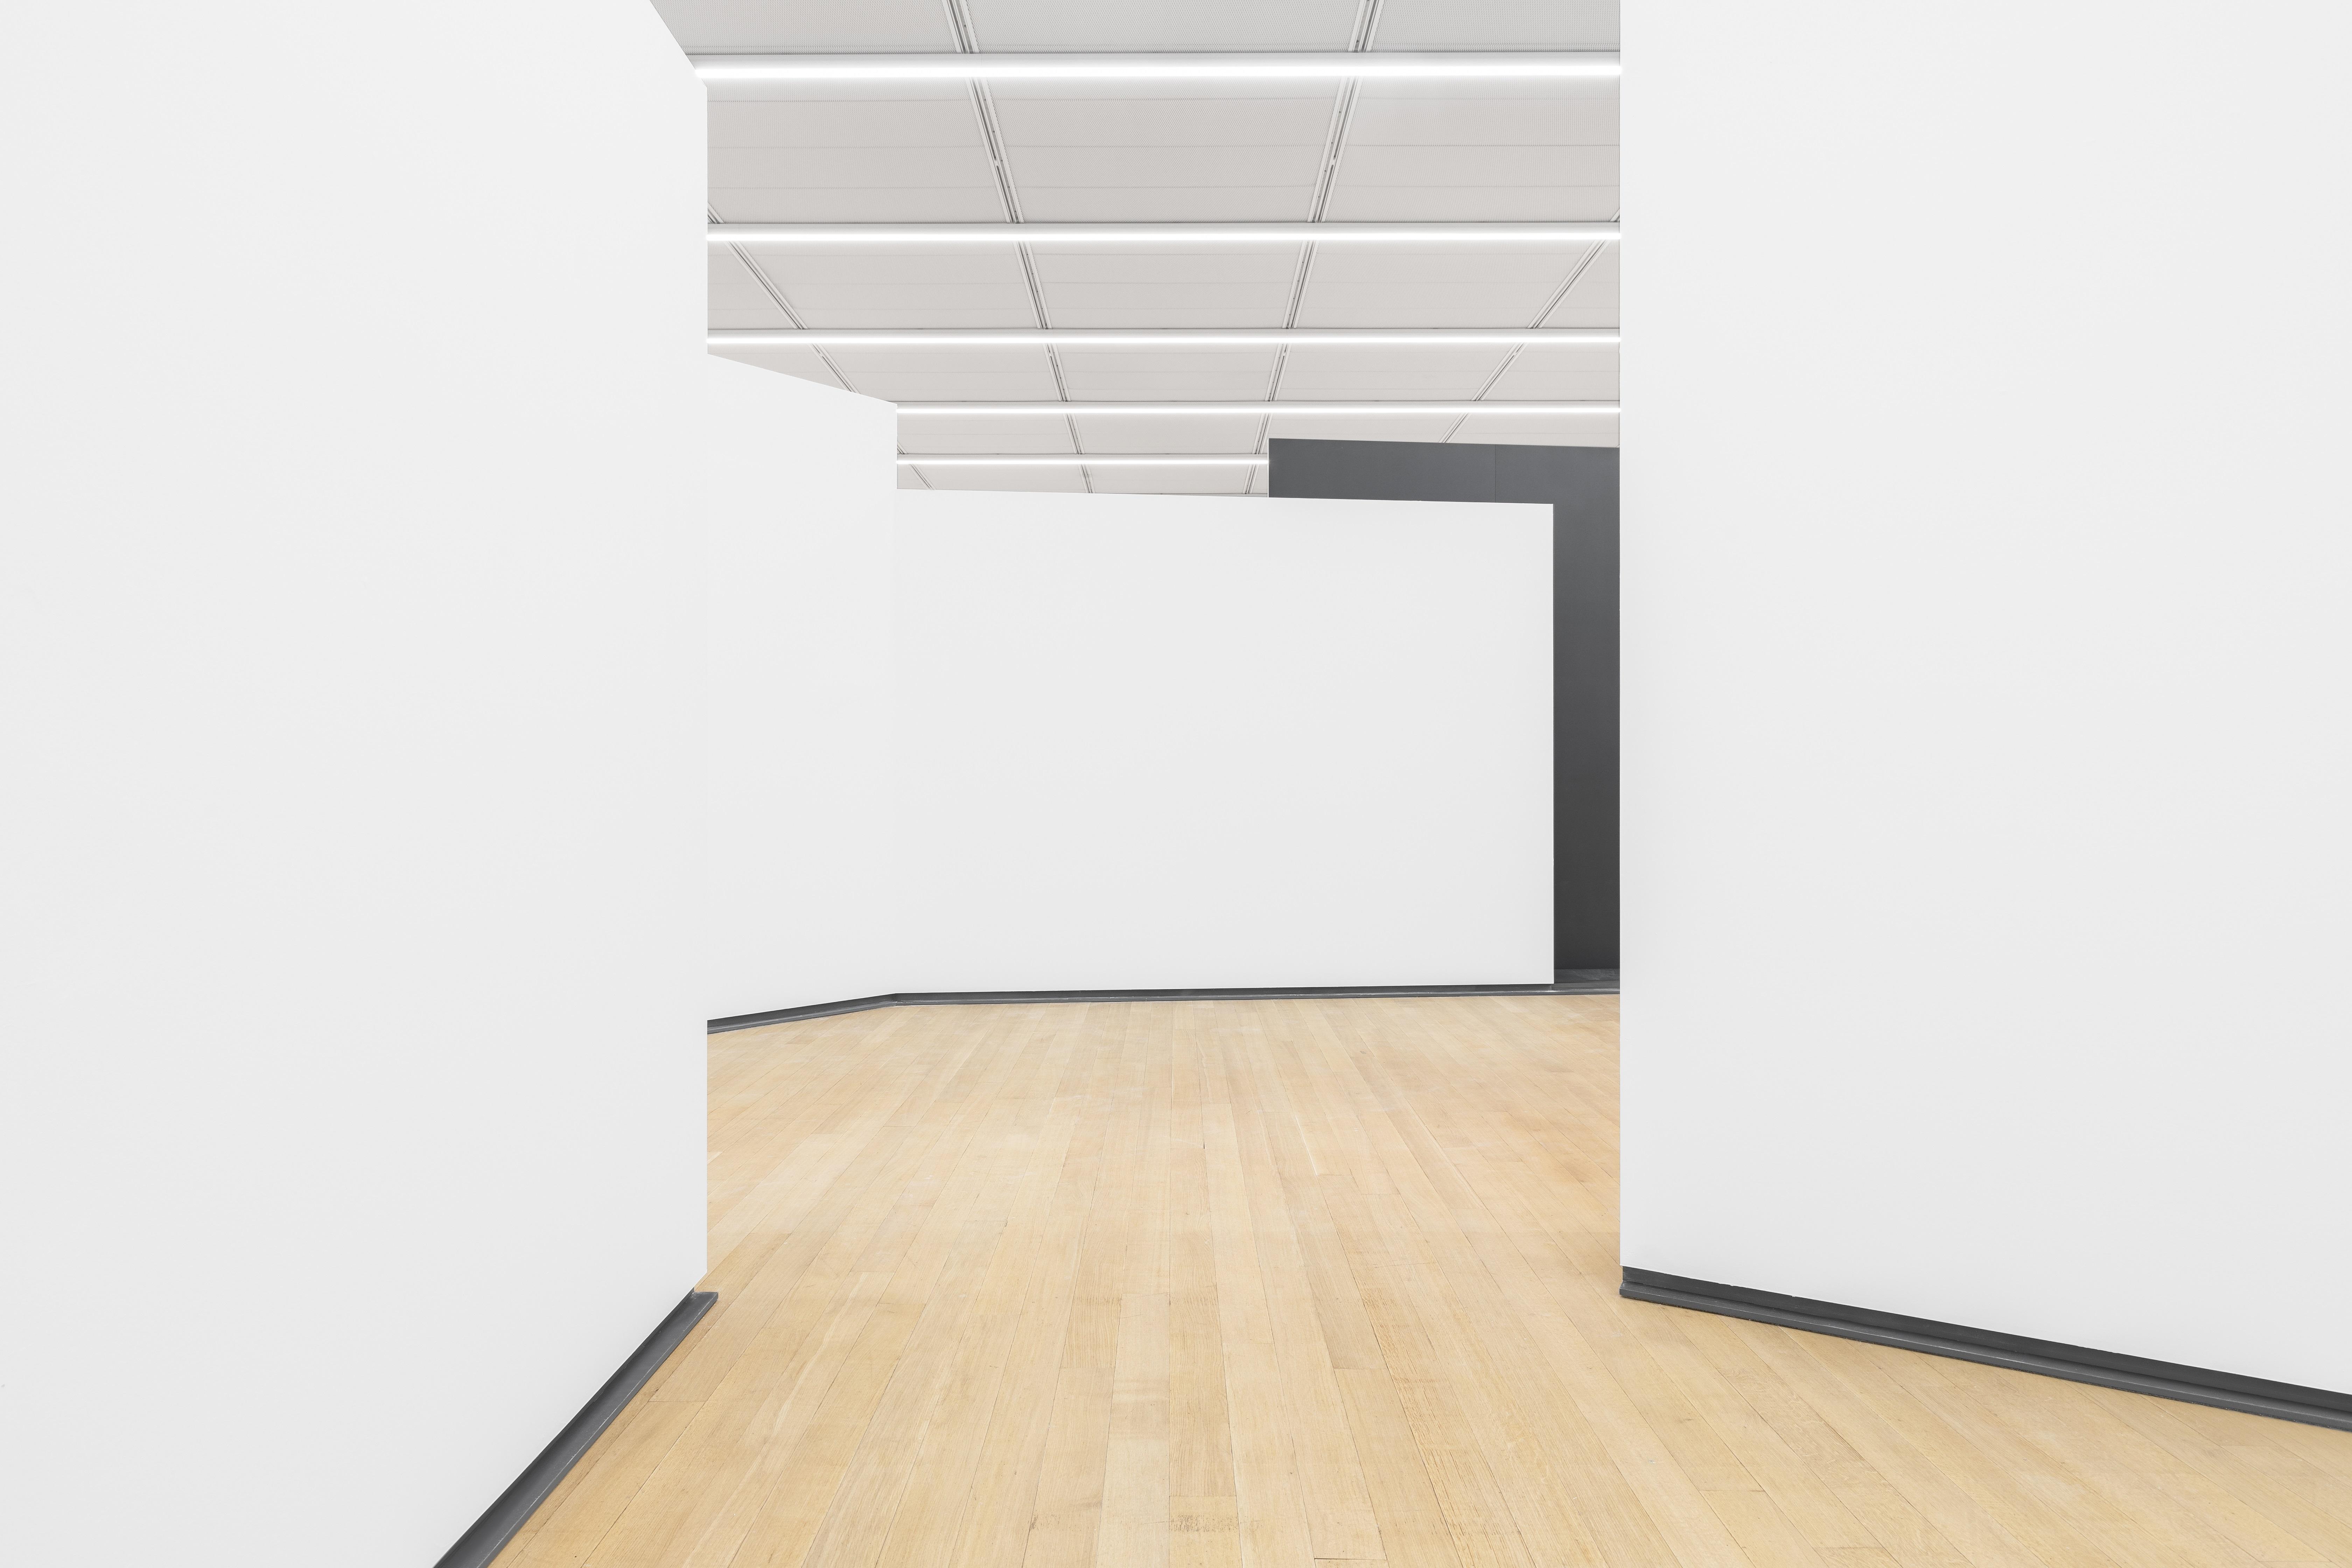 <p>Inrichting Stedelijk Base, Stedelijk Museum  Amsterdam, door oma. Beeld Delfino Sisto Legnani & Marco Cappelletti</p>